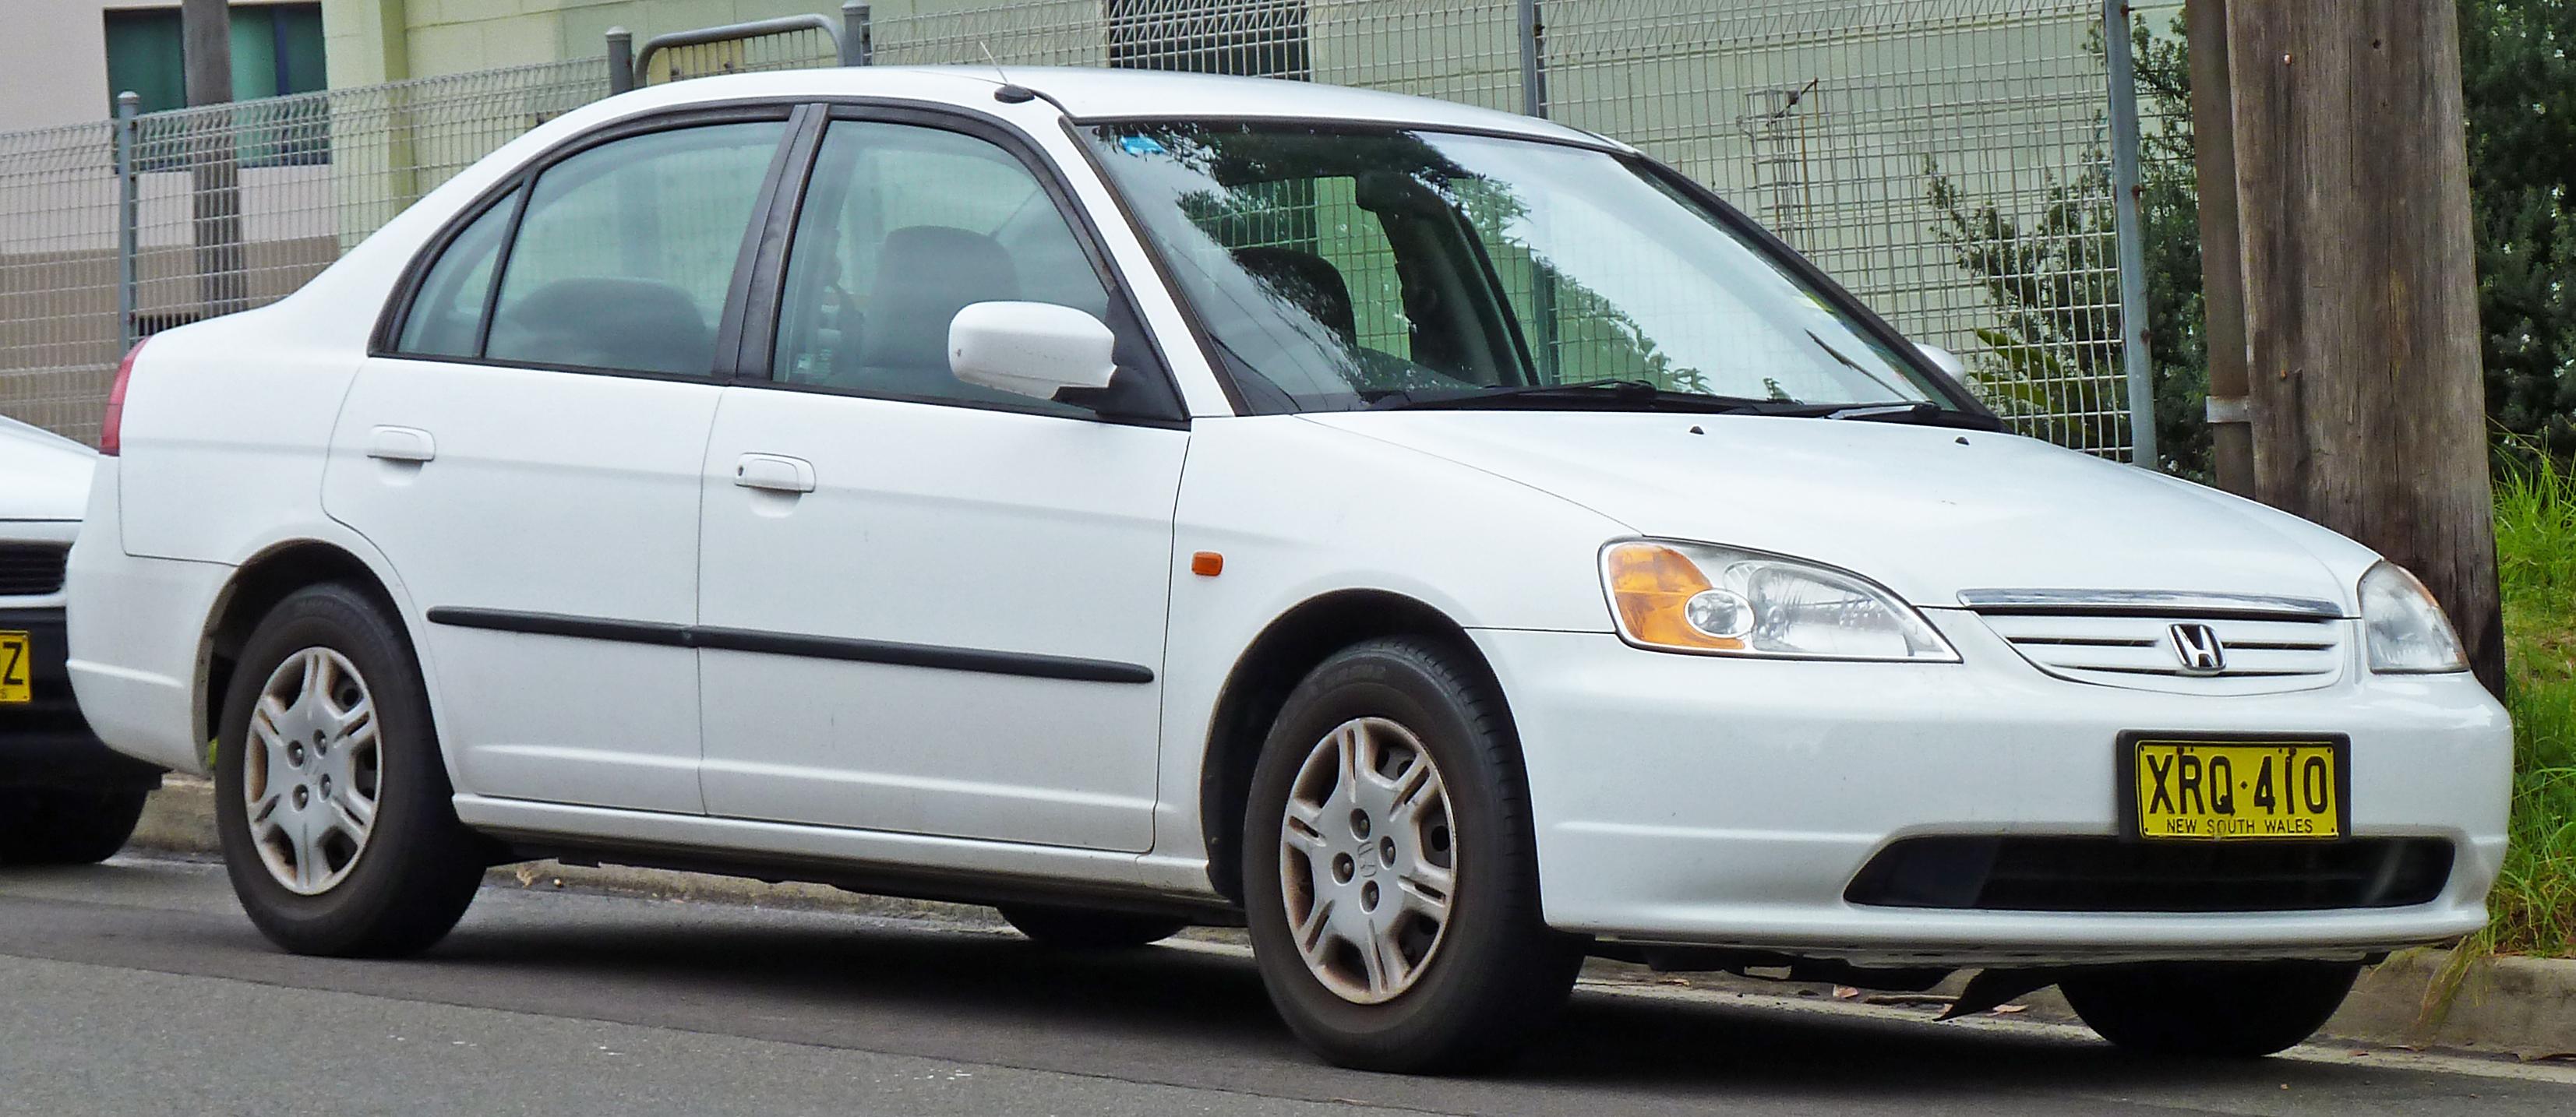 File:2000-2002 Honda Civic GLi sedan 02.jpg - Wikimedia Commons